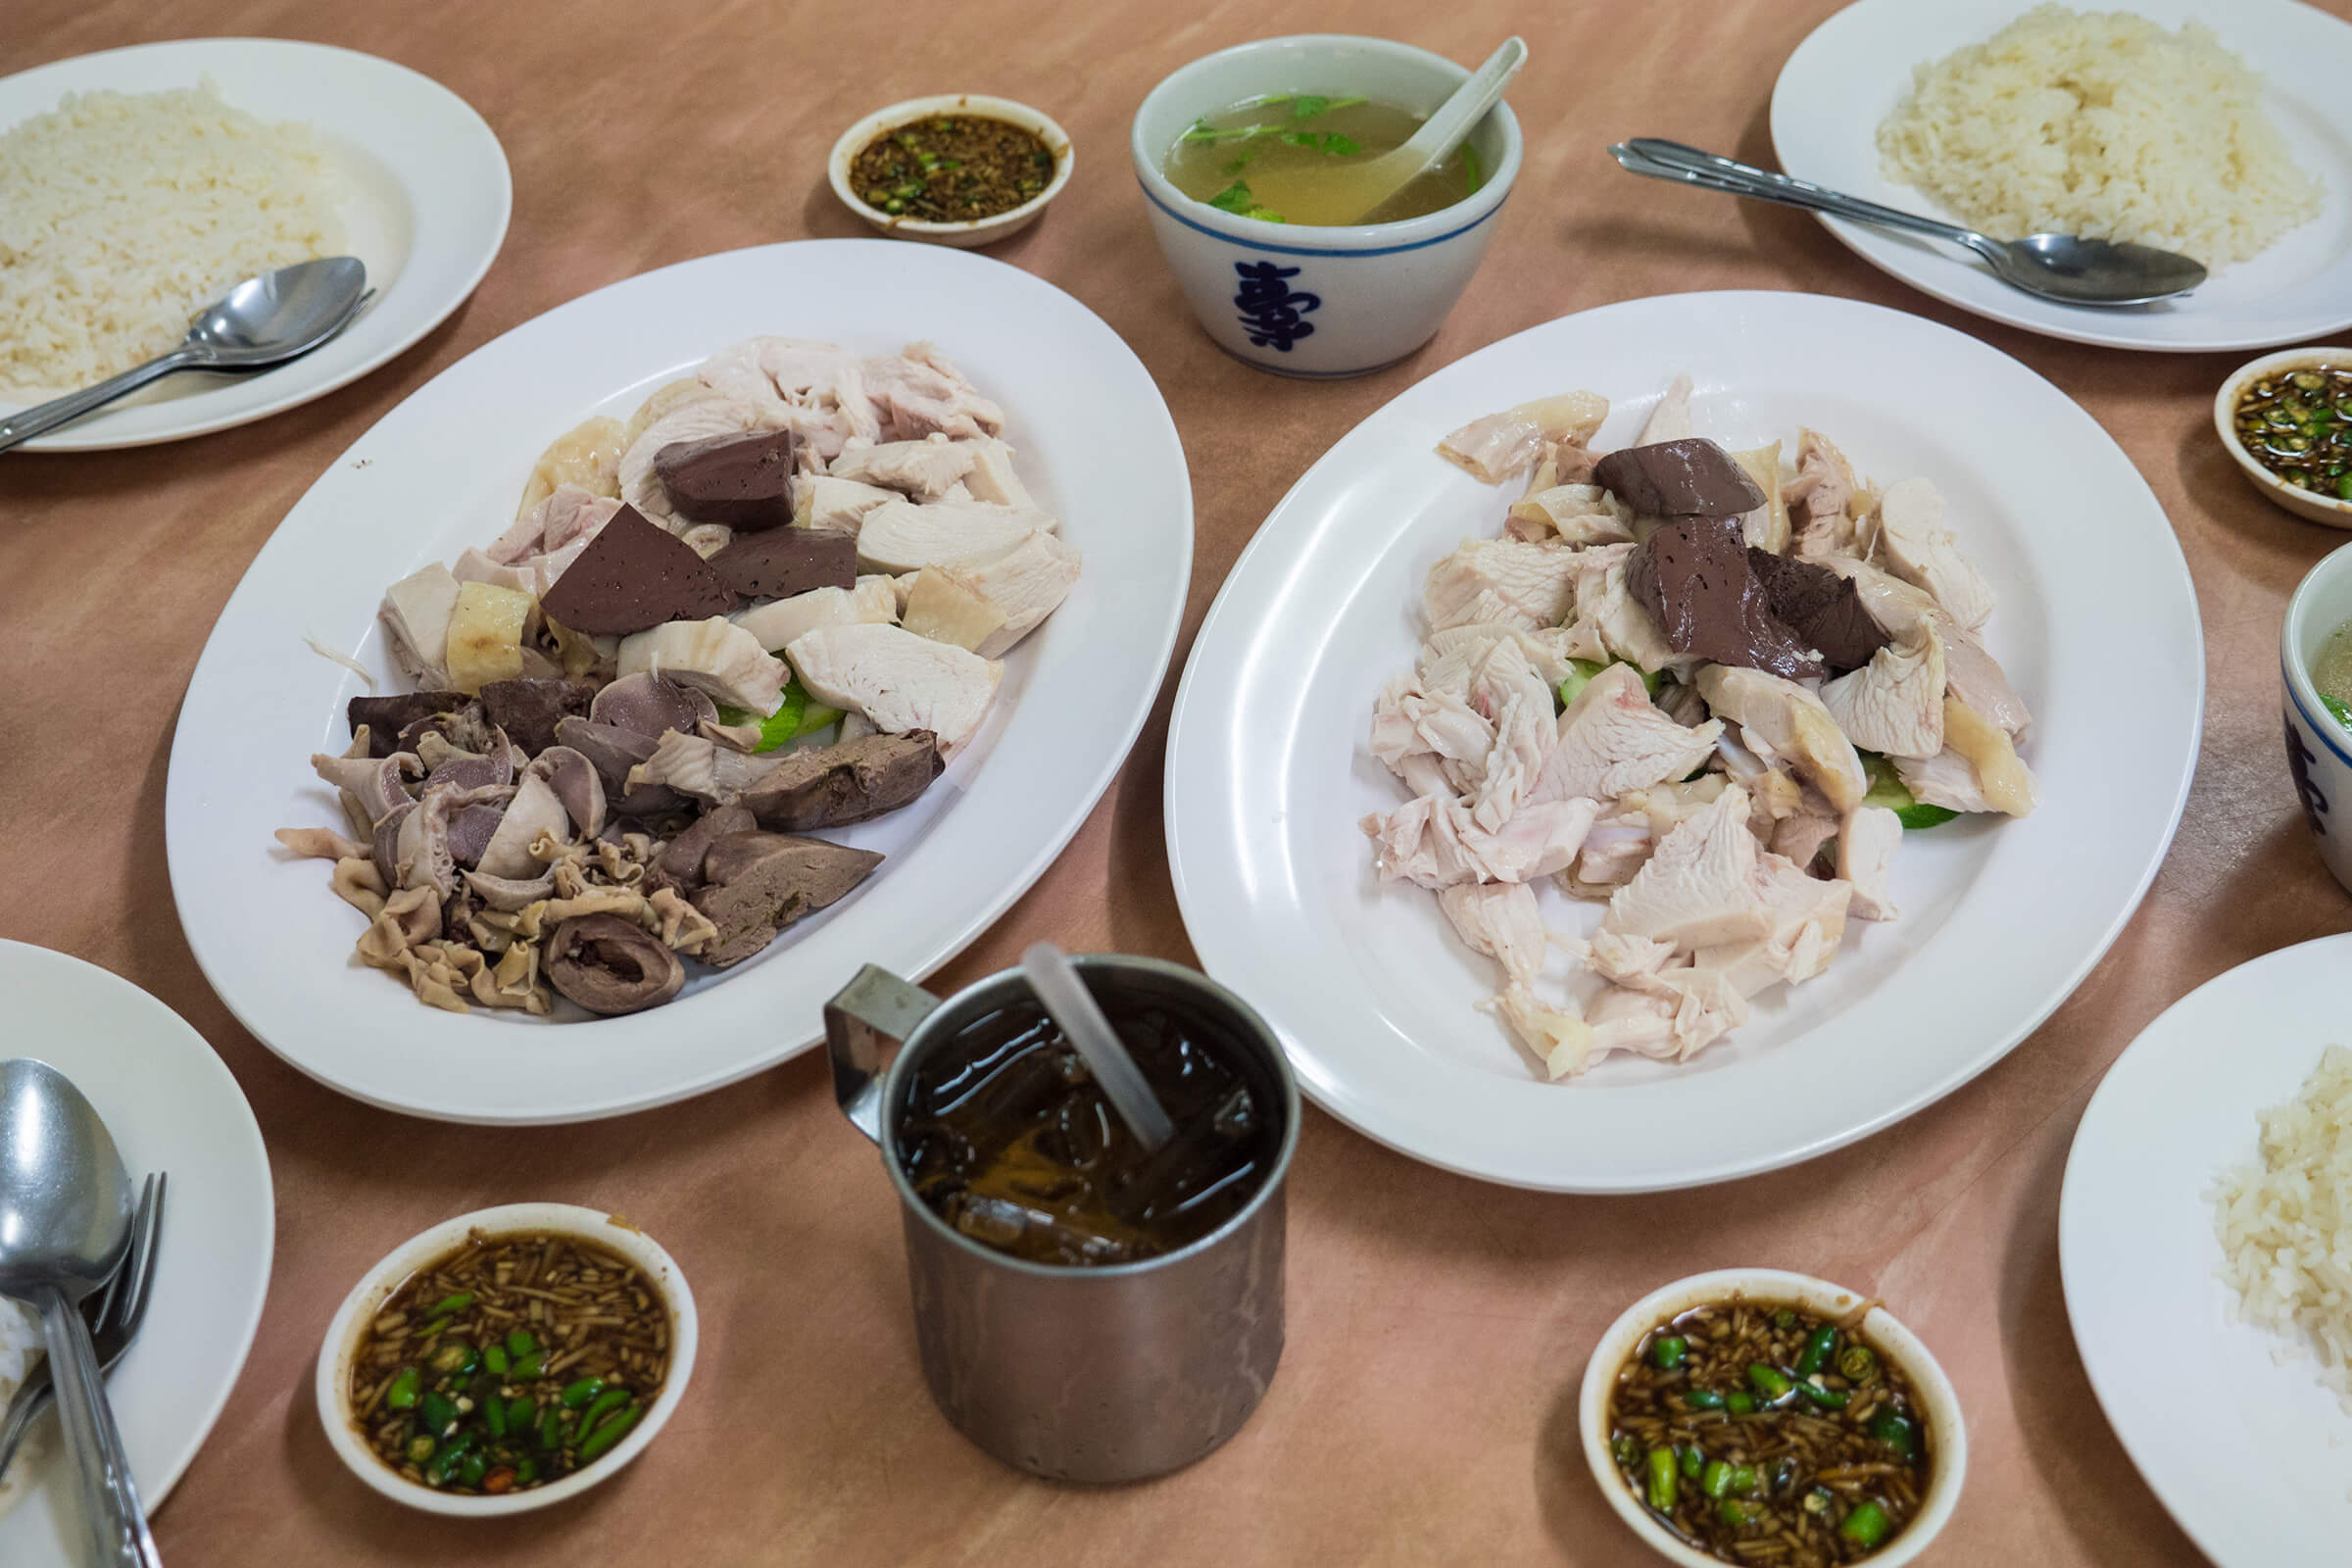 Plump and Juicy Chicken Rice at Khao Man Gai Jae Yee (ข้าวมันไก่เจ๊ยี)